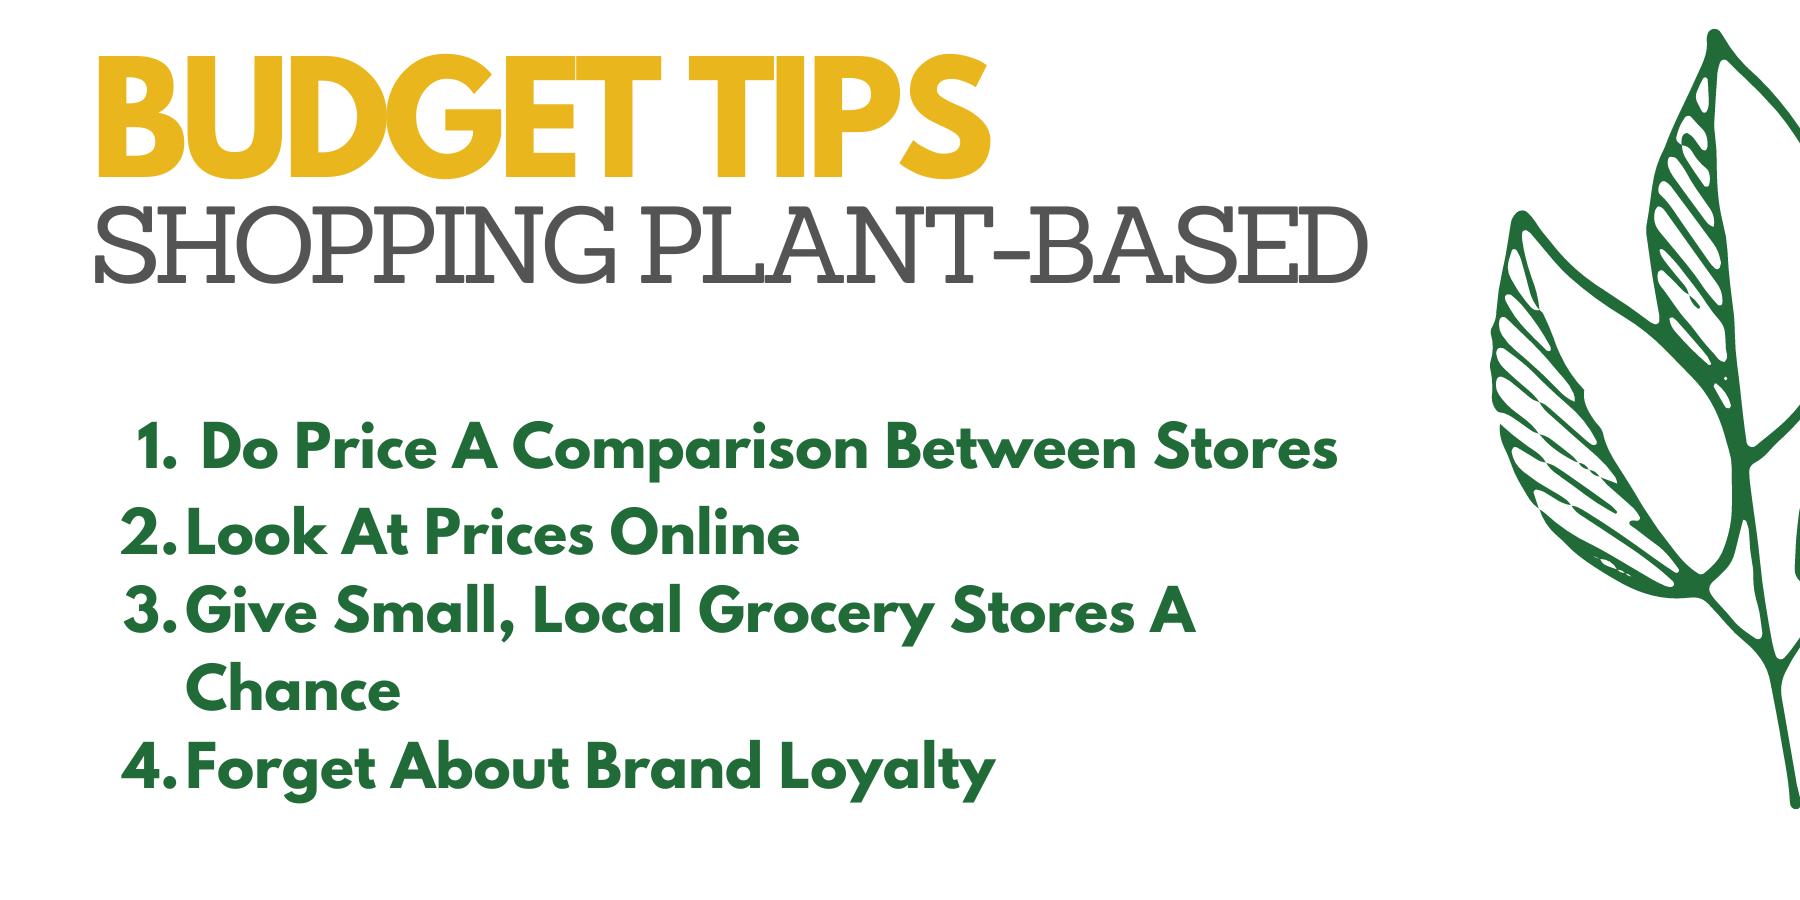 Shopping plant-based budget tips